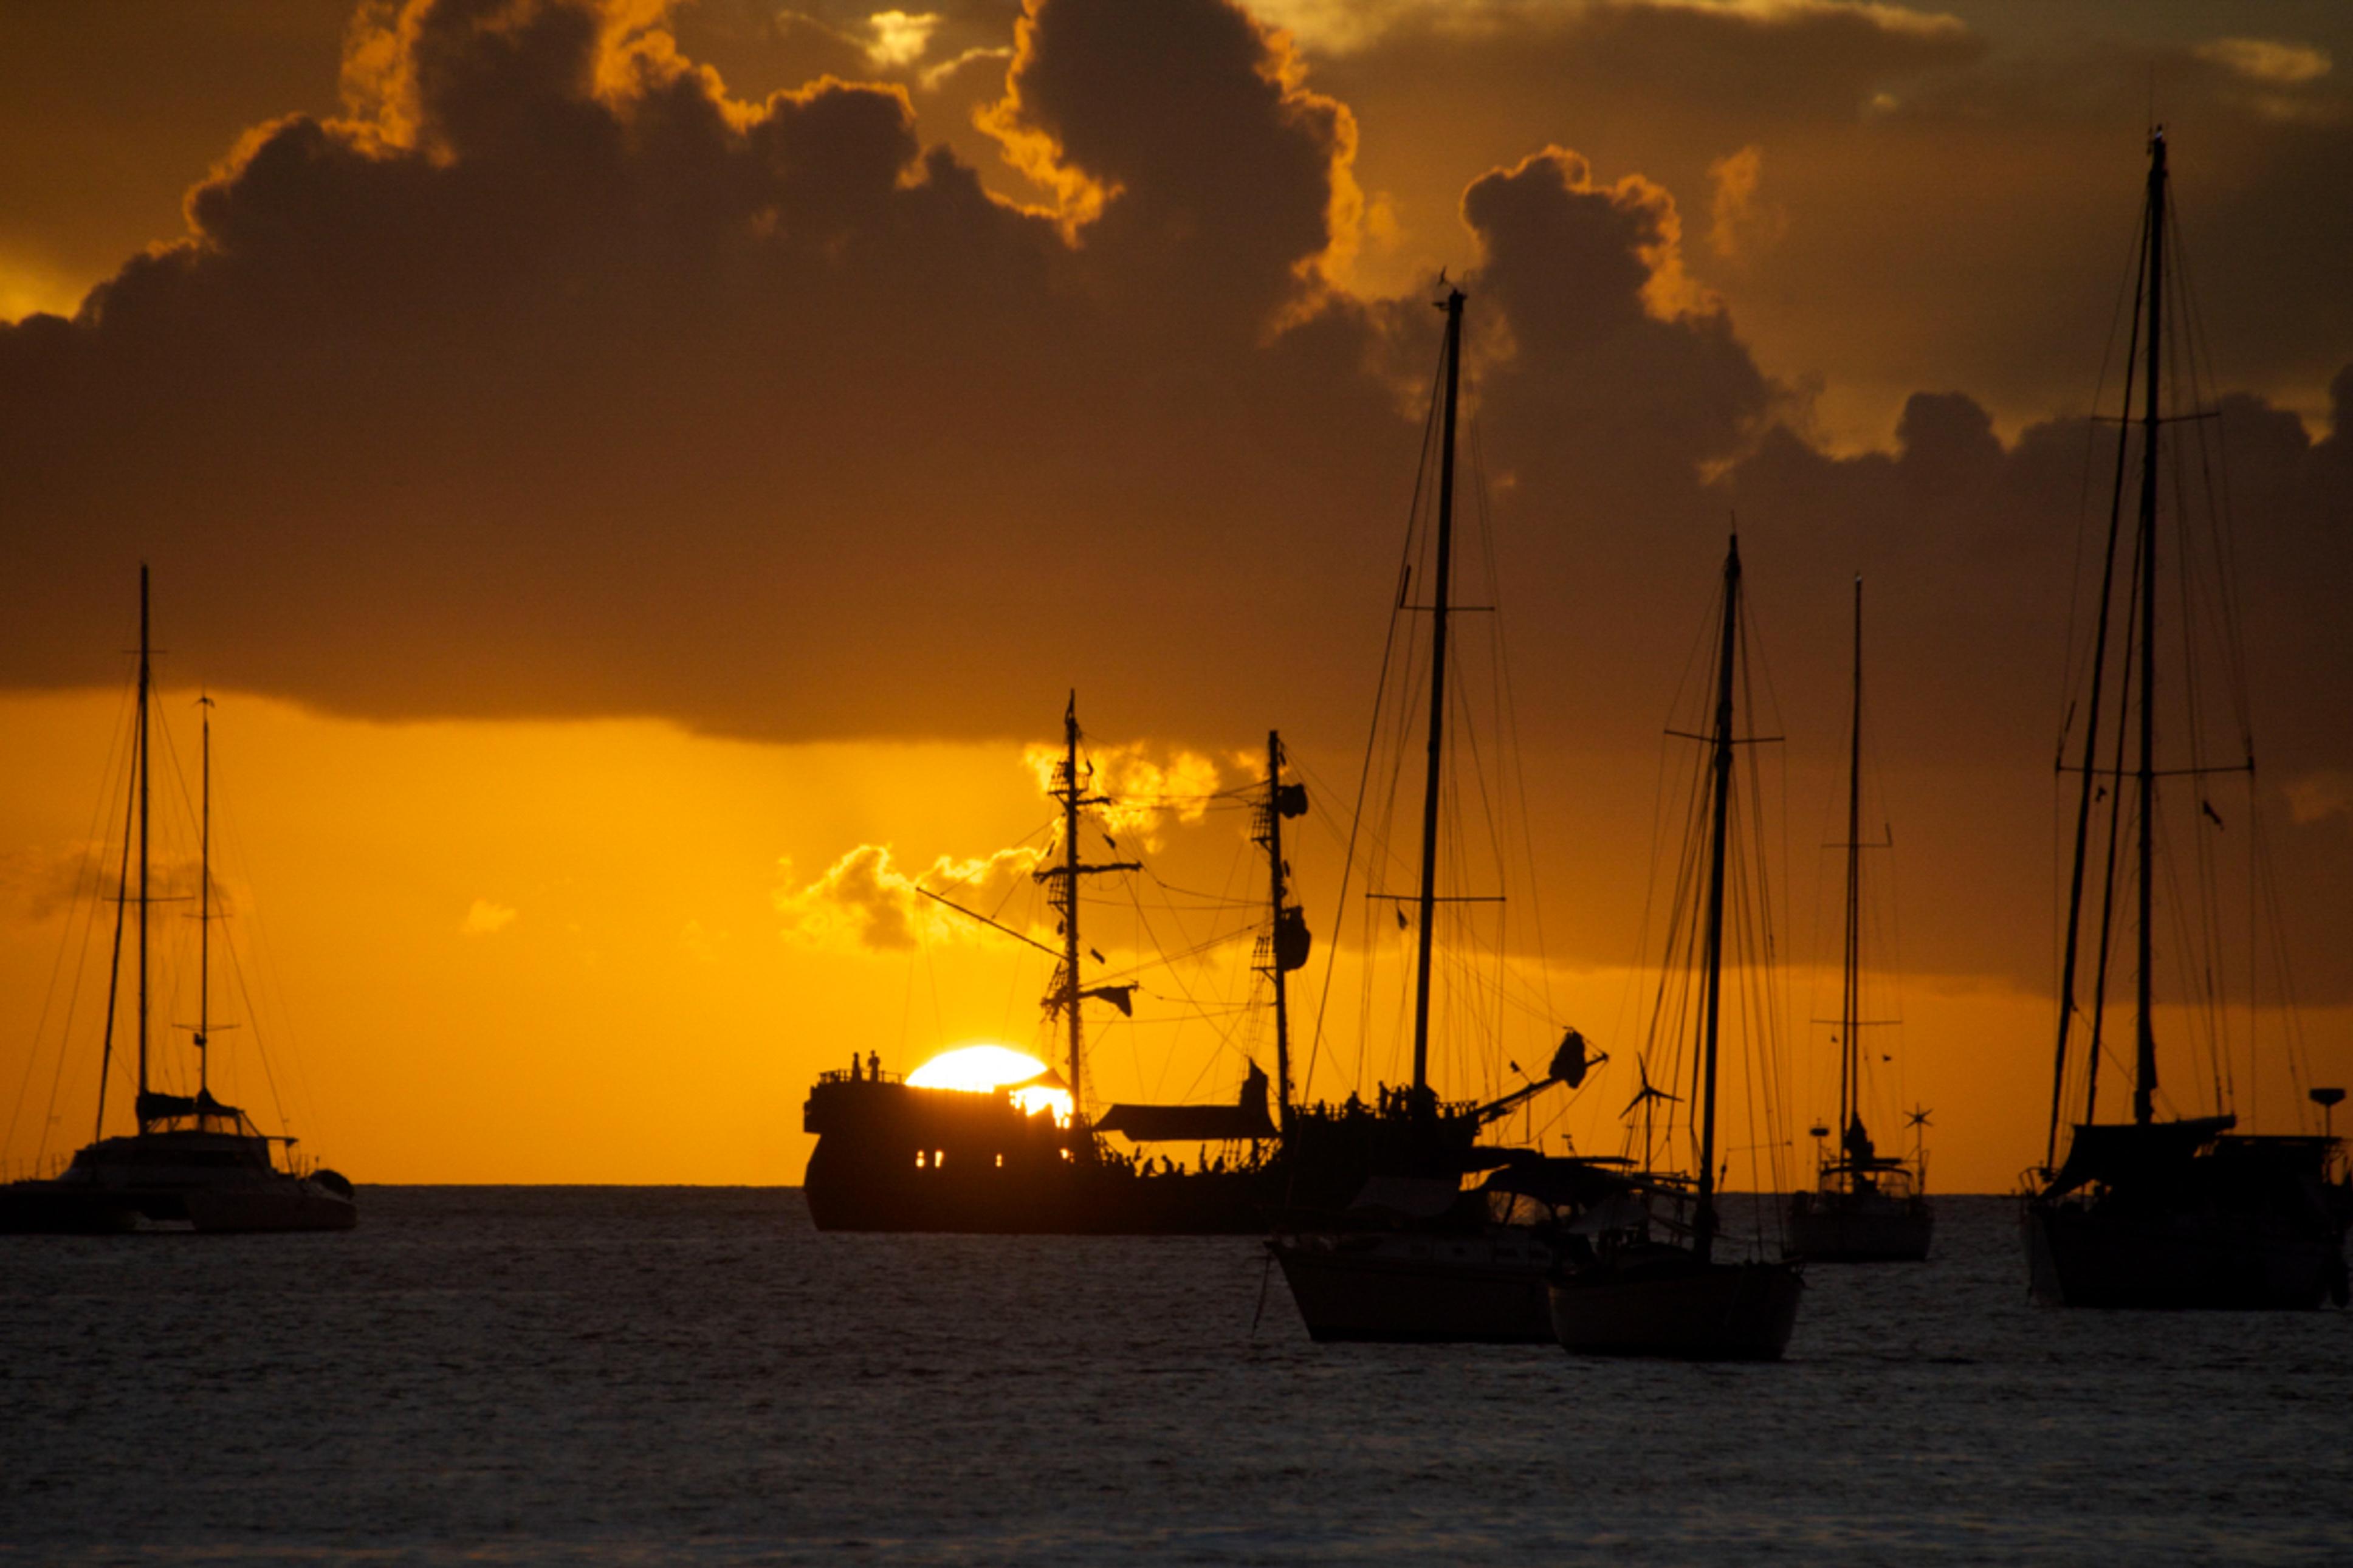 Sonnenuntergang, St. Lucia